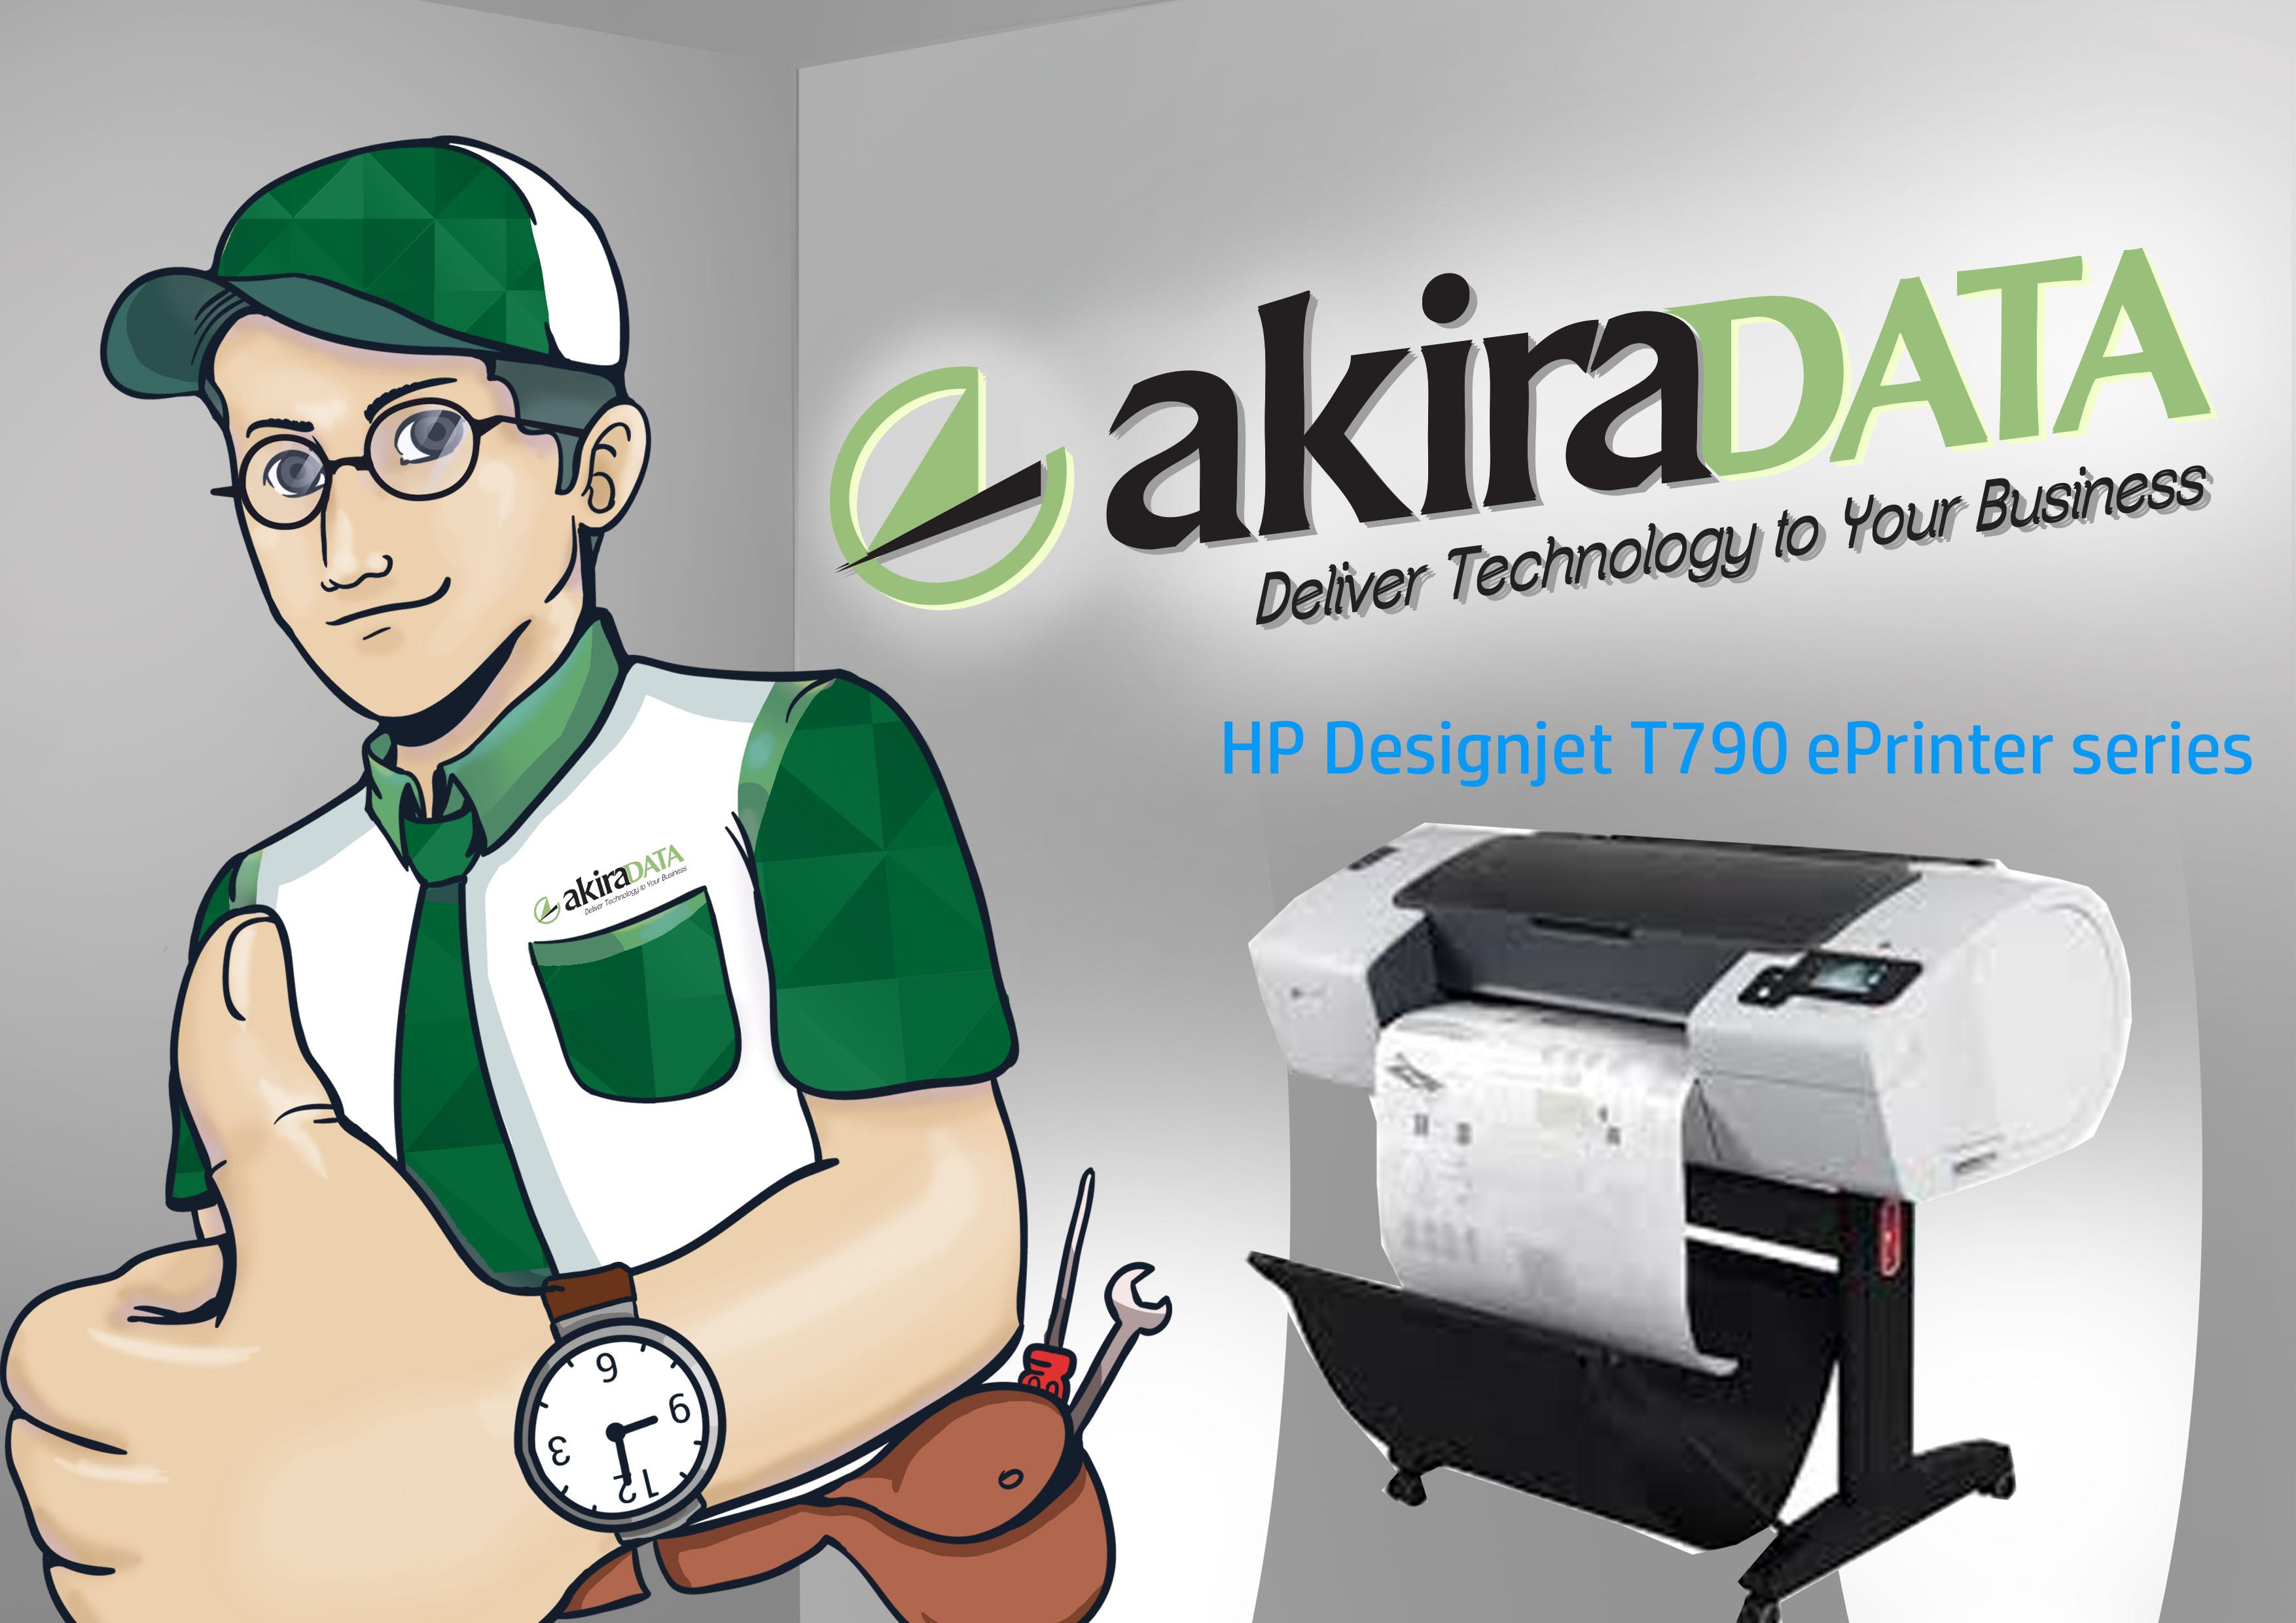 service plotter HP Designjet T790 ePrinter series